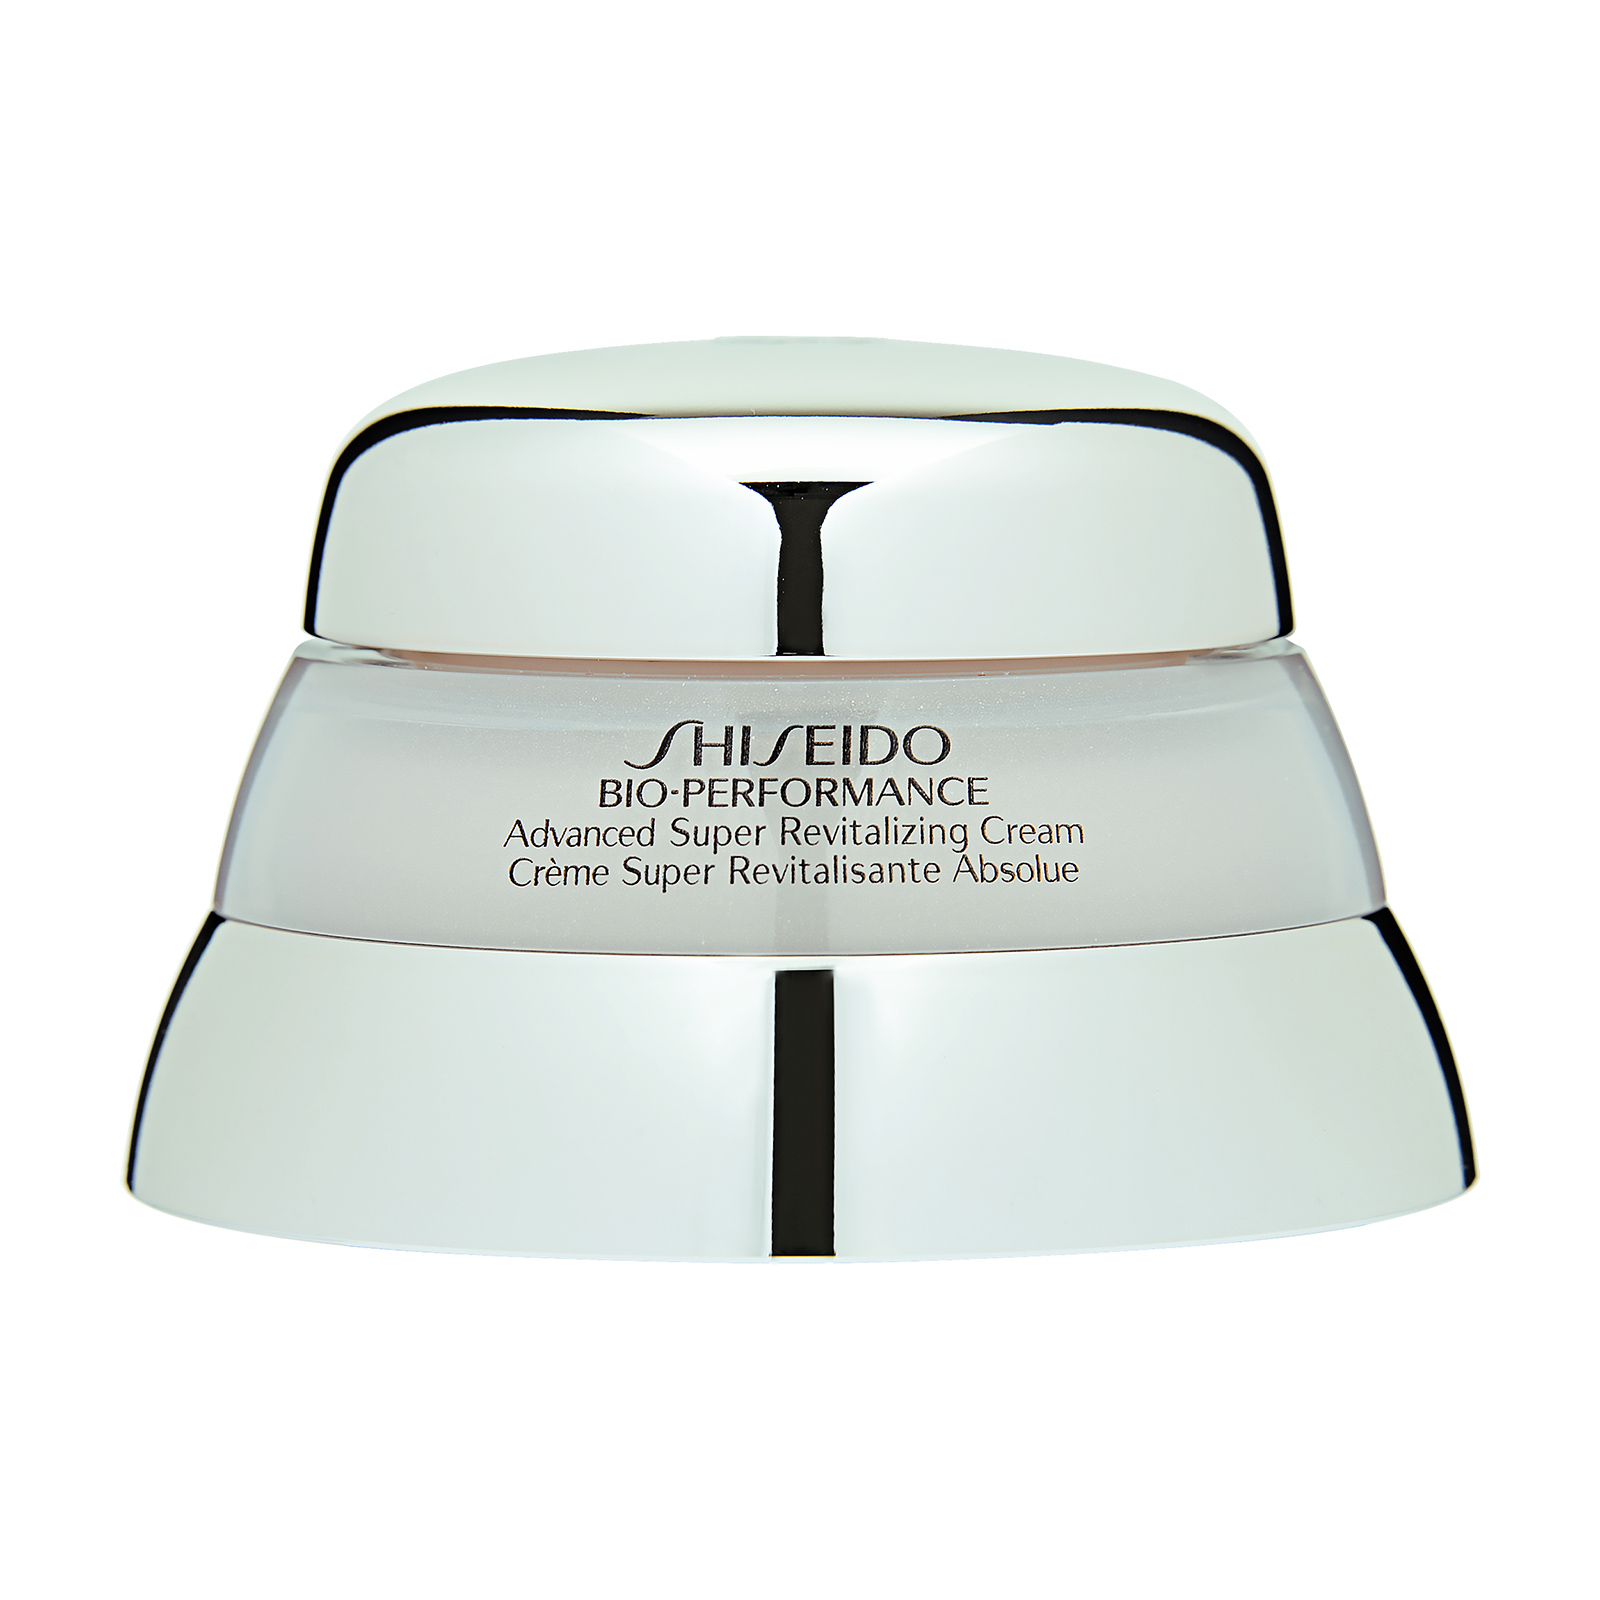 Shiseido Bio-Performance  Advanced Super Revitalizing Cream 1.7oz, 50ml from Cosme-De.com